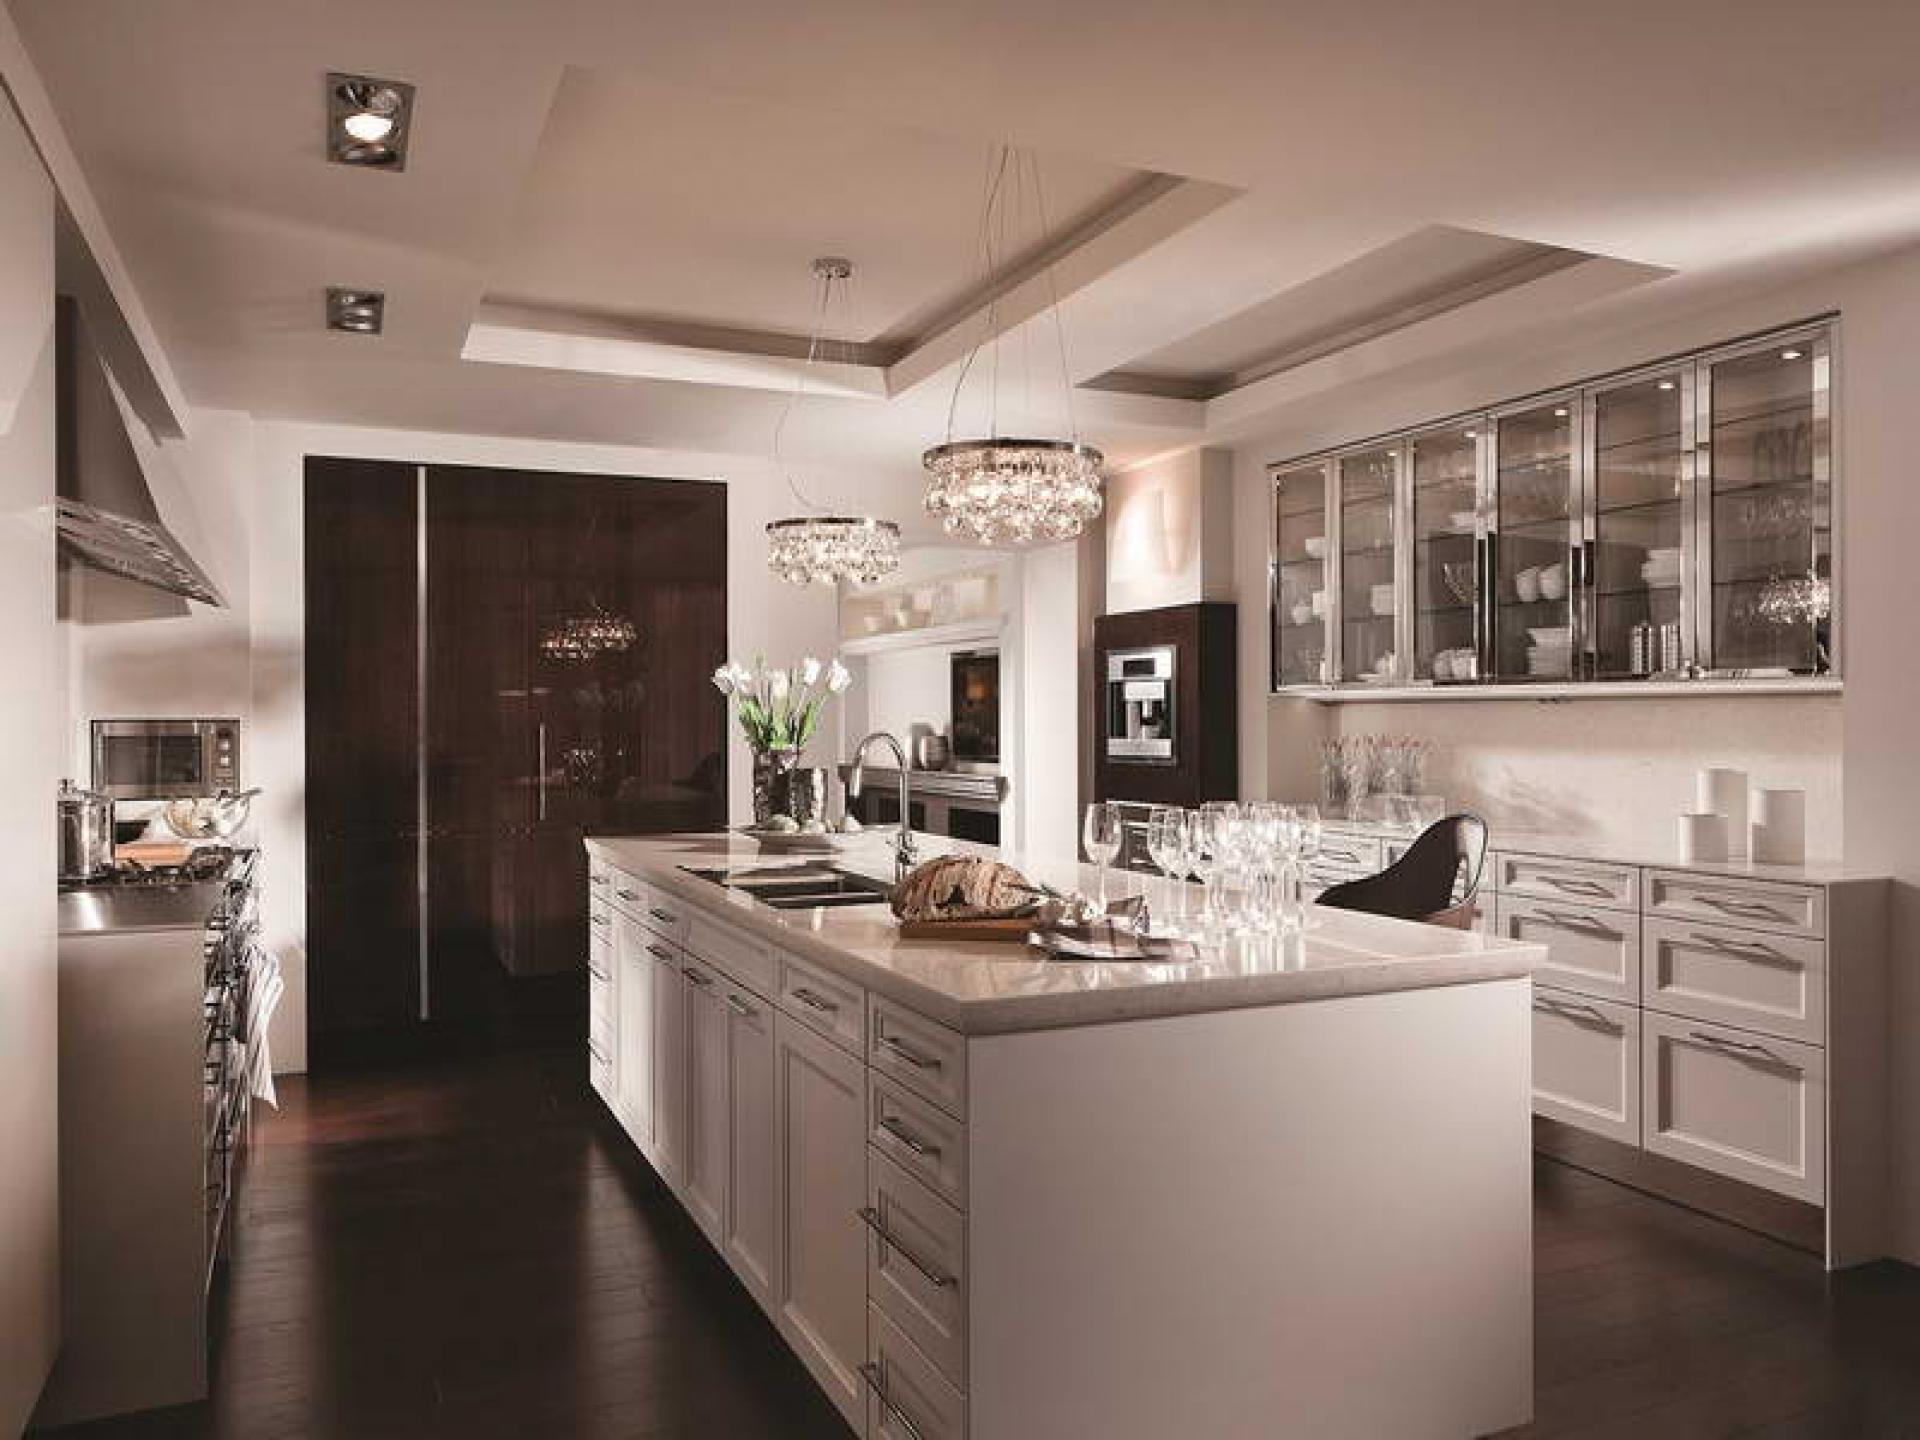 candice olson kitchen cabinet hardware photo - 2